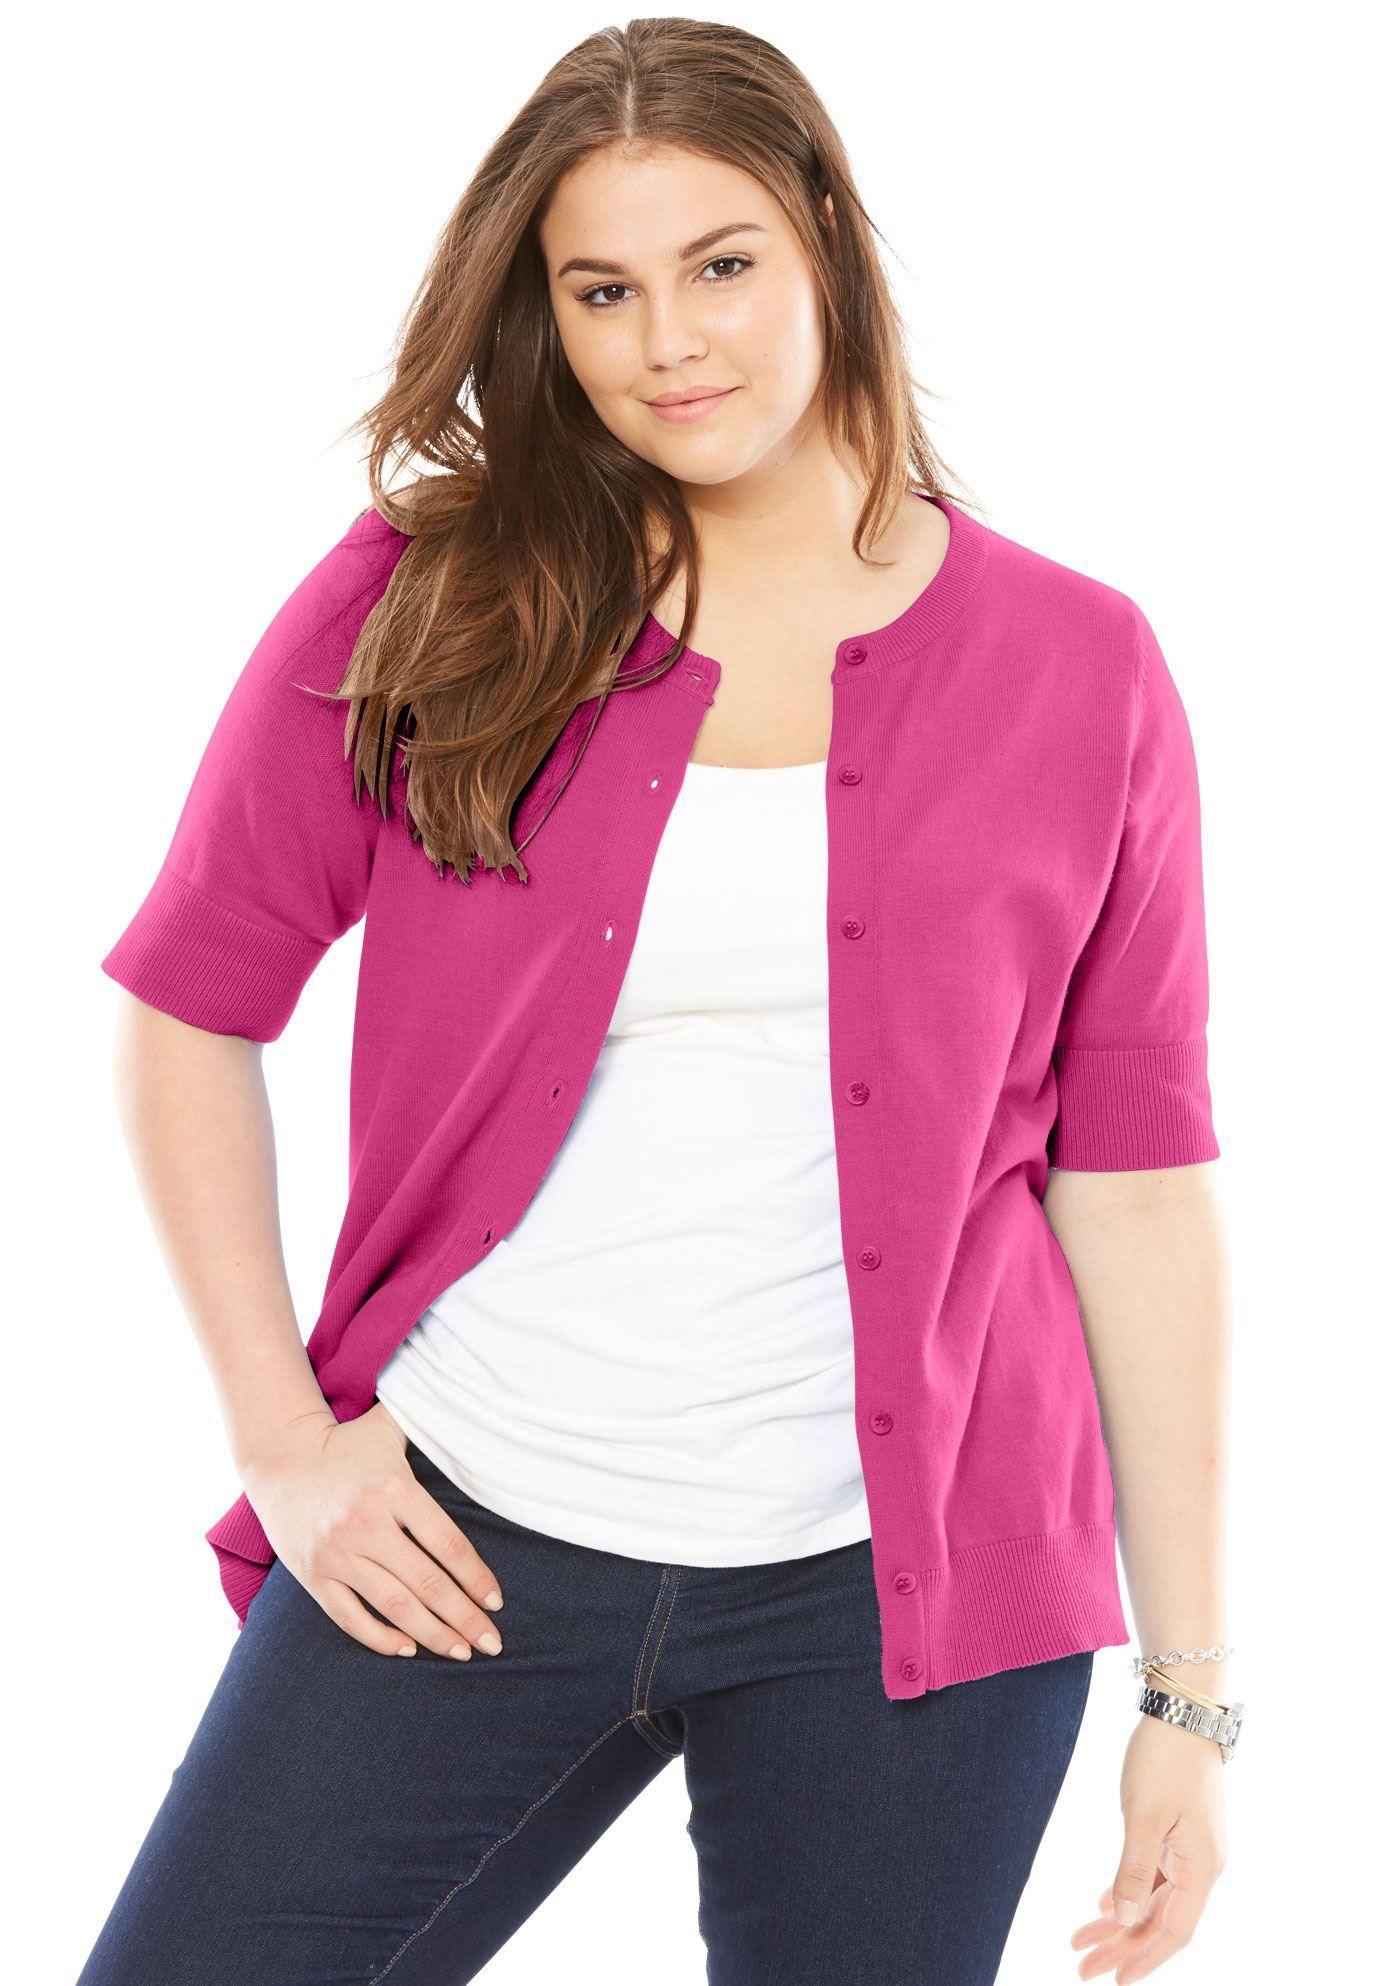 73135793eca Perfect Elbow-Length Sleeve Cardigan - Women s Plus Size Clothing ...